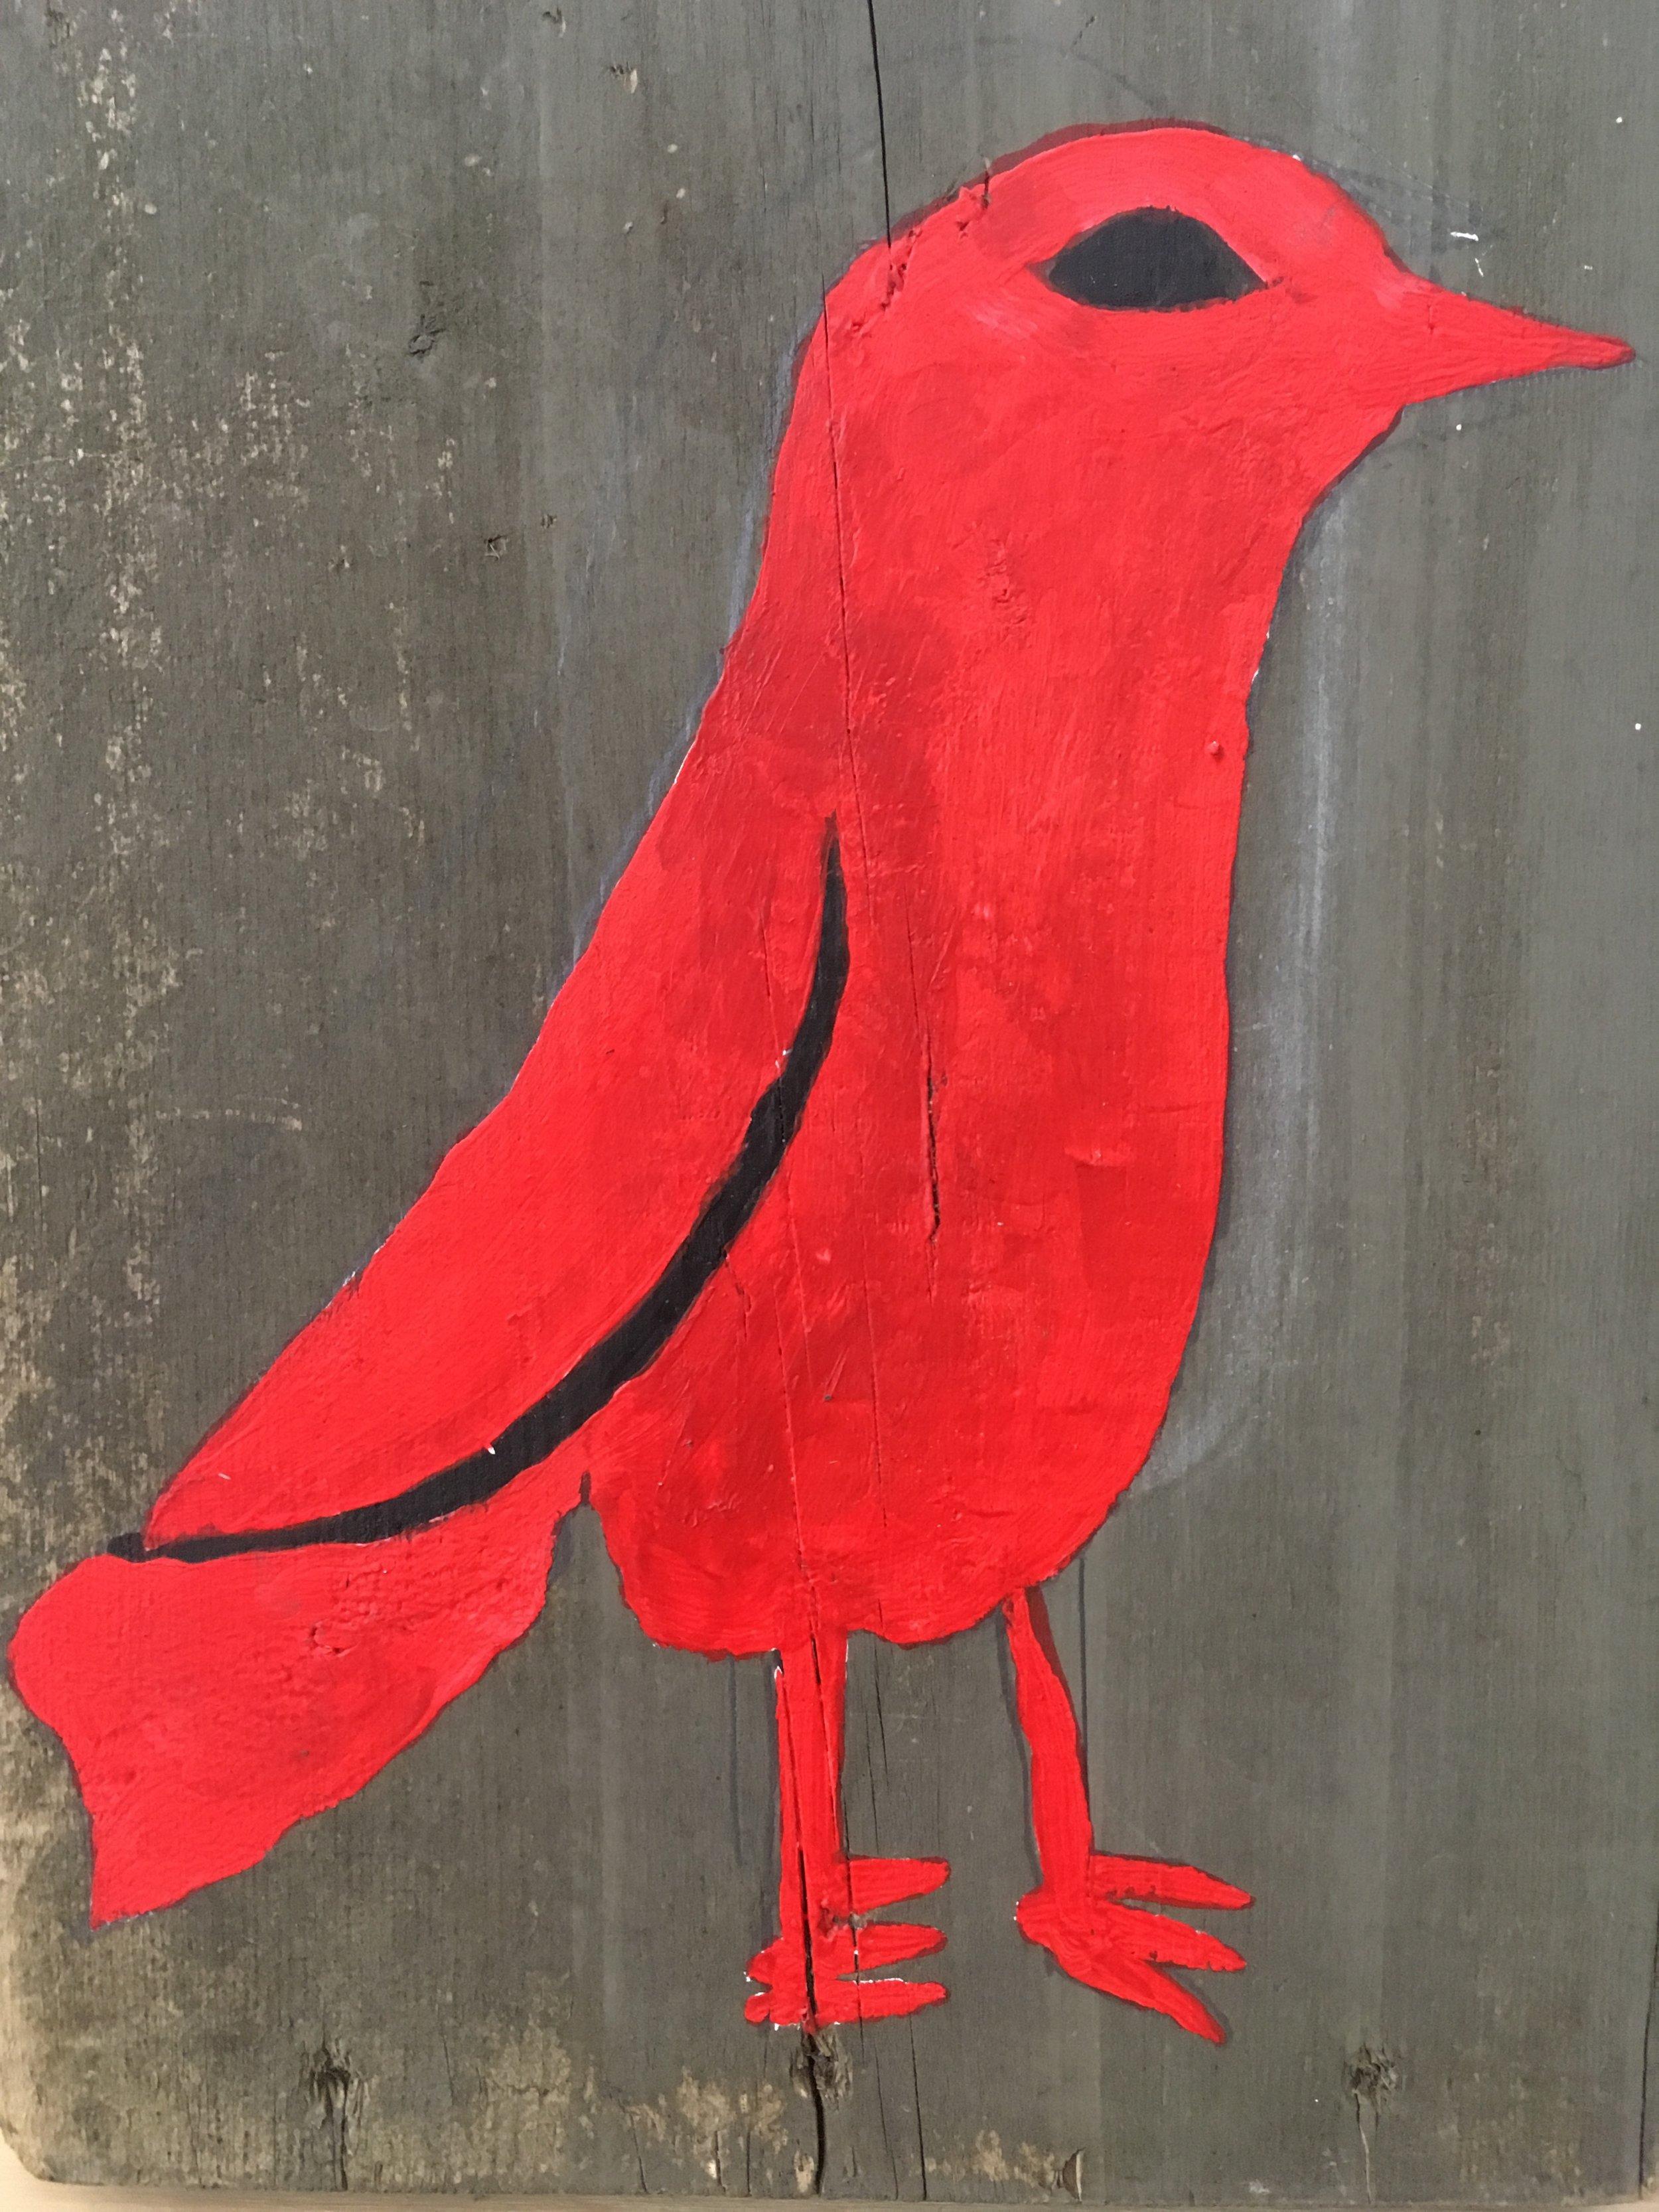 Romas Astrauskas,Red Bird, 2017, acrylic on wood, 12 X 9 inches